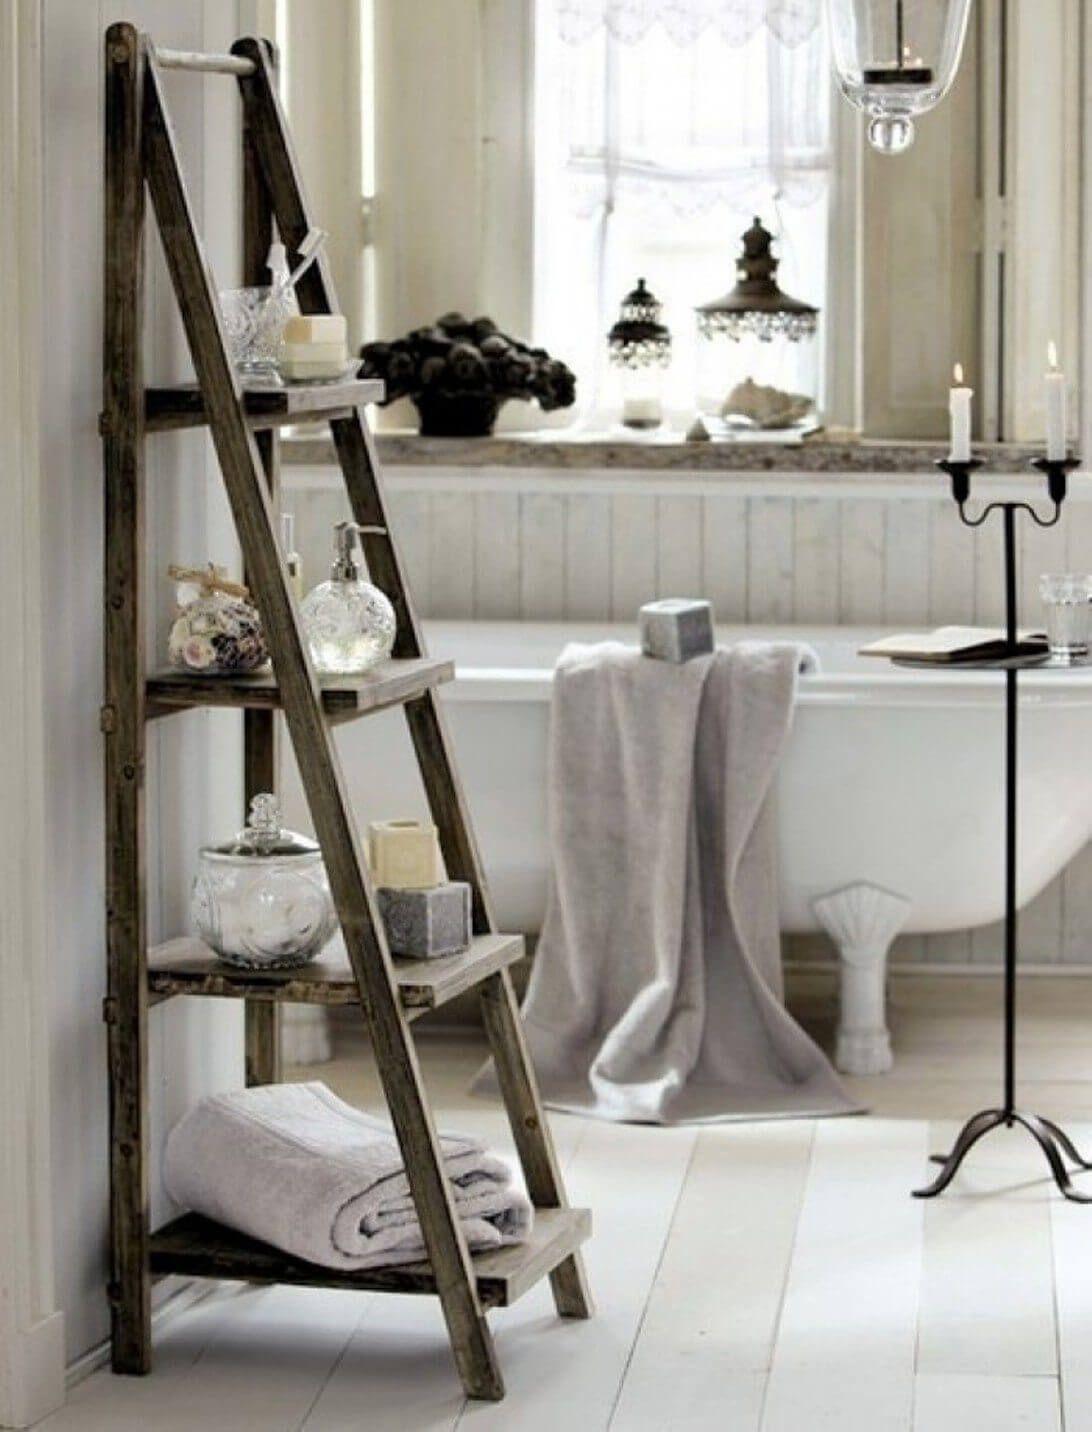 Farmhouse bathroom design - Farmhouse Bathroom Design 18